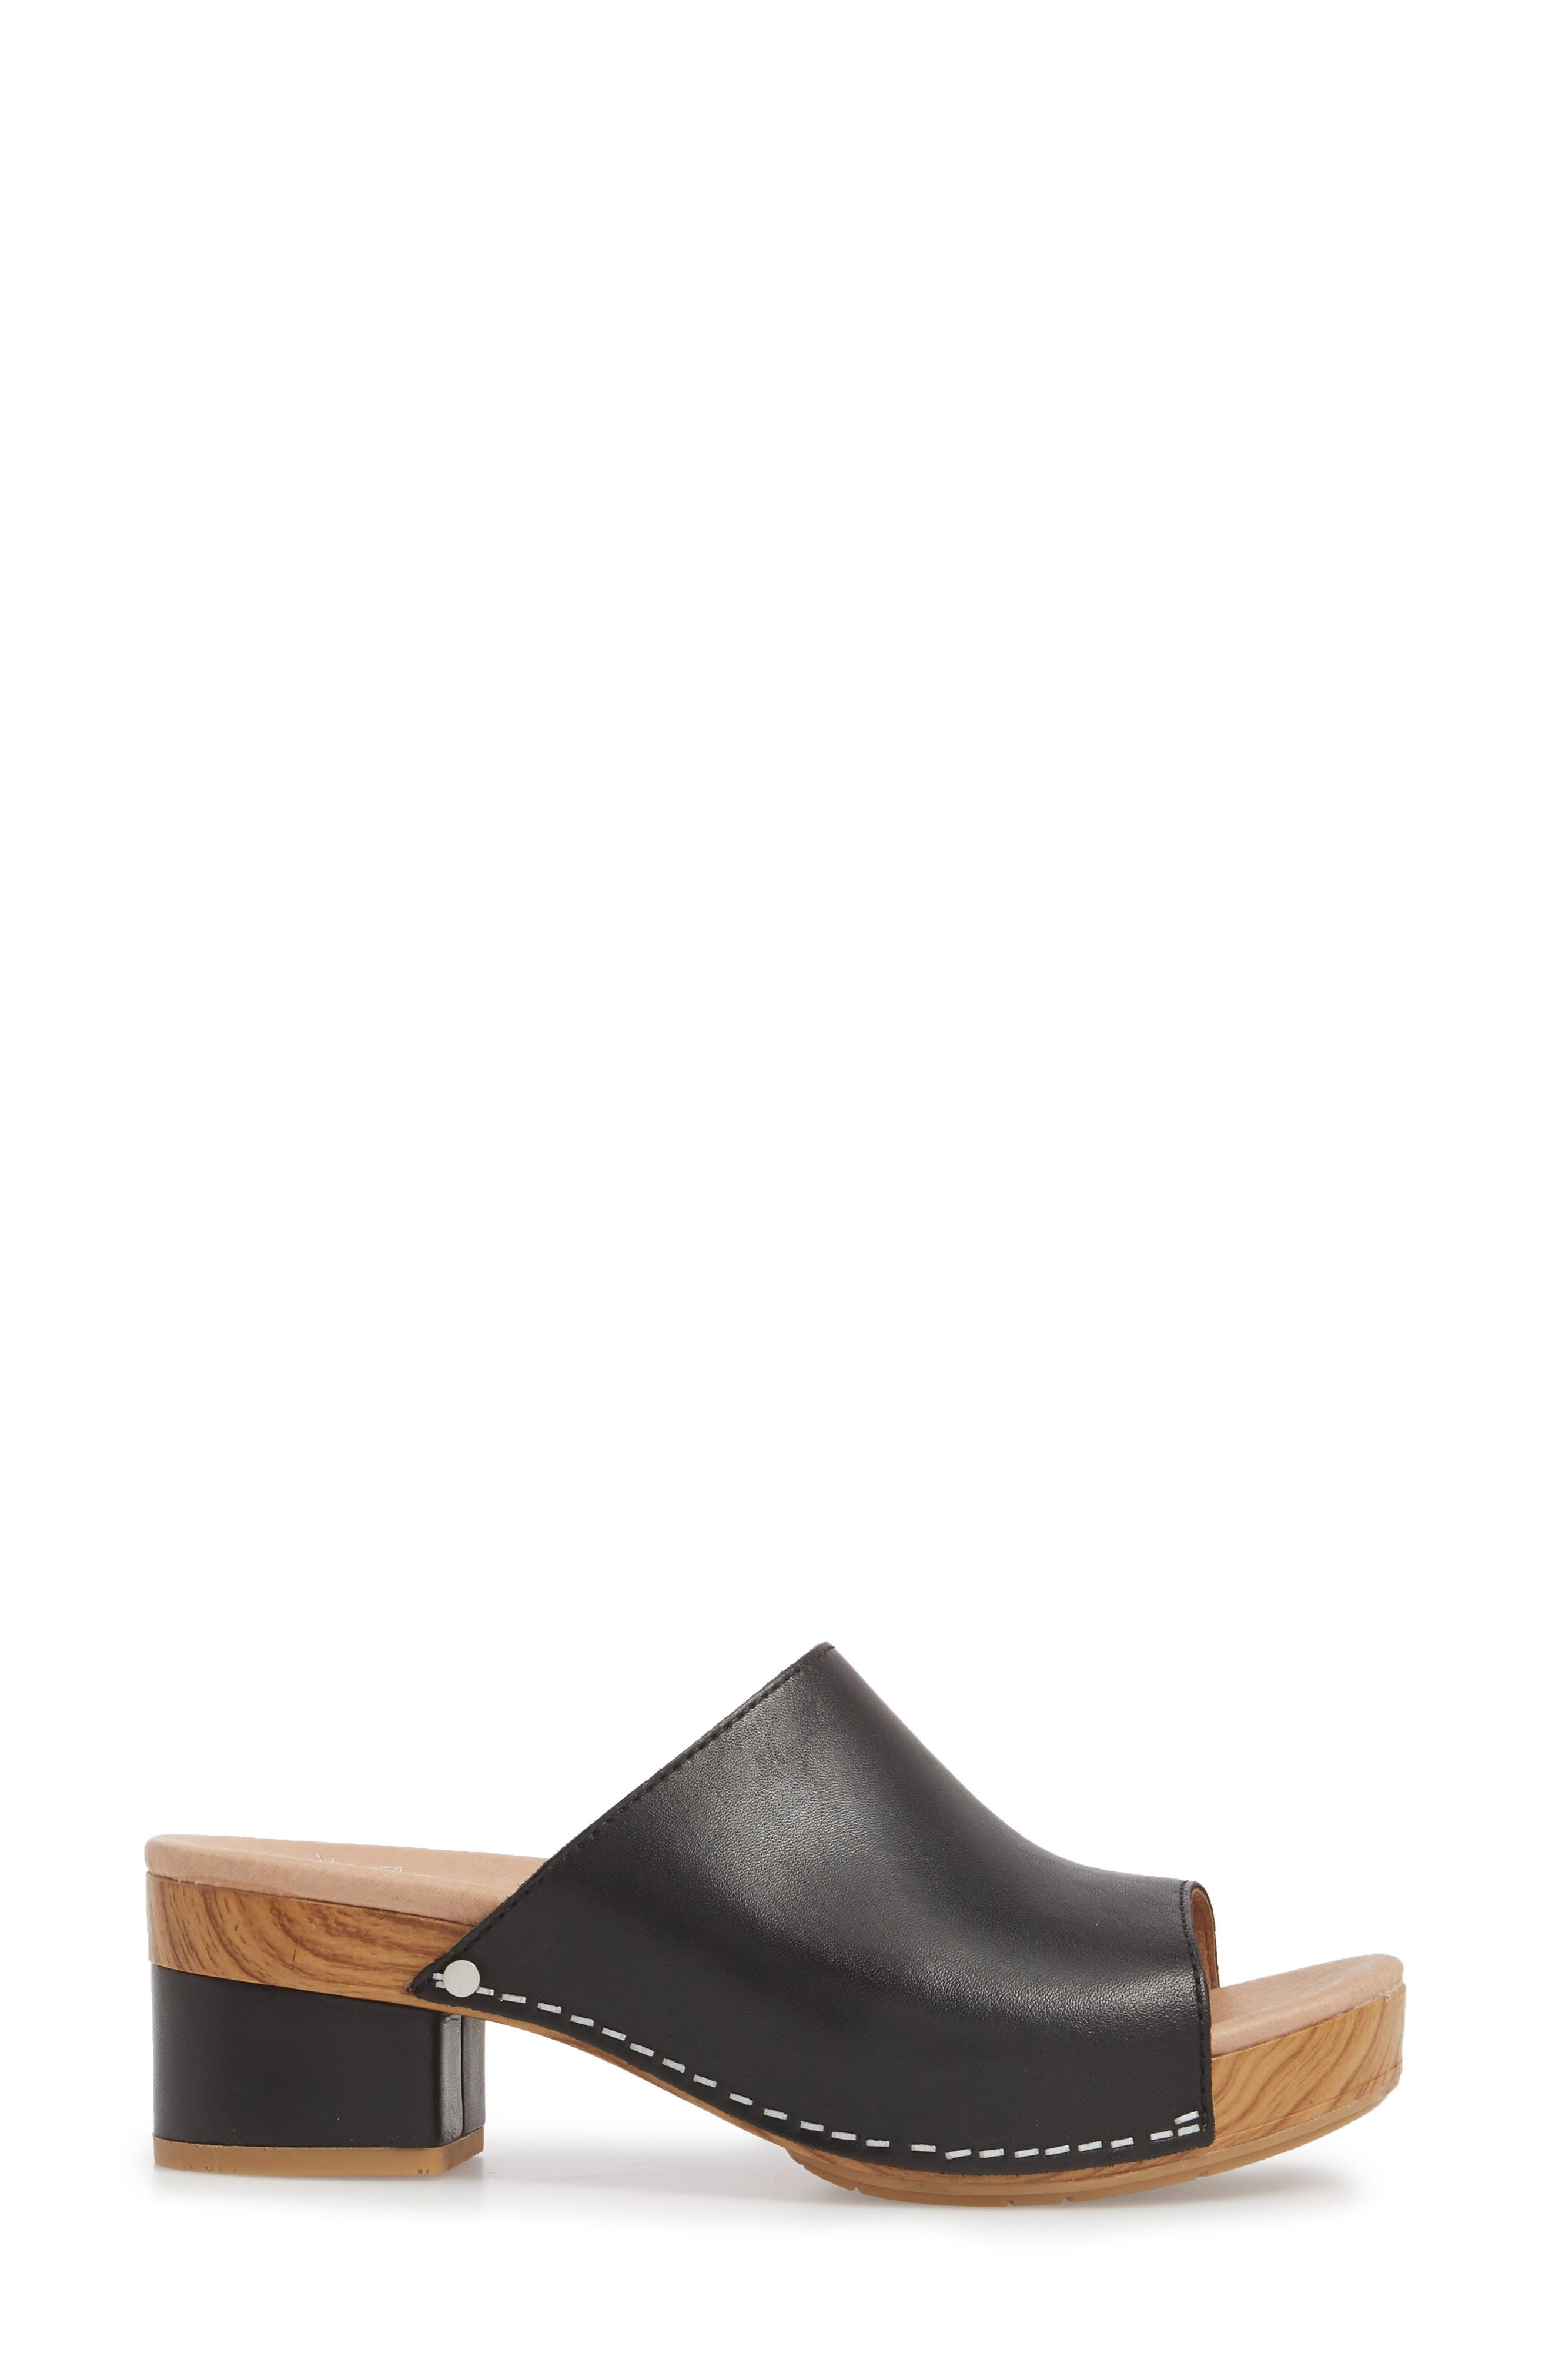 DANSKO, Maci Mule Sandal, Alternate thumbnail 3, color, BLACK LEATHER